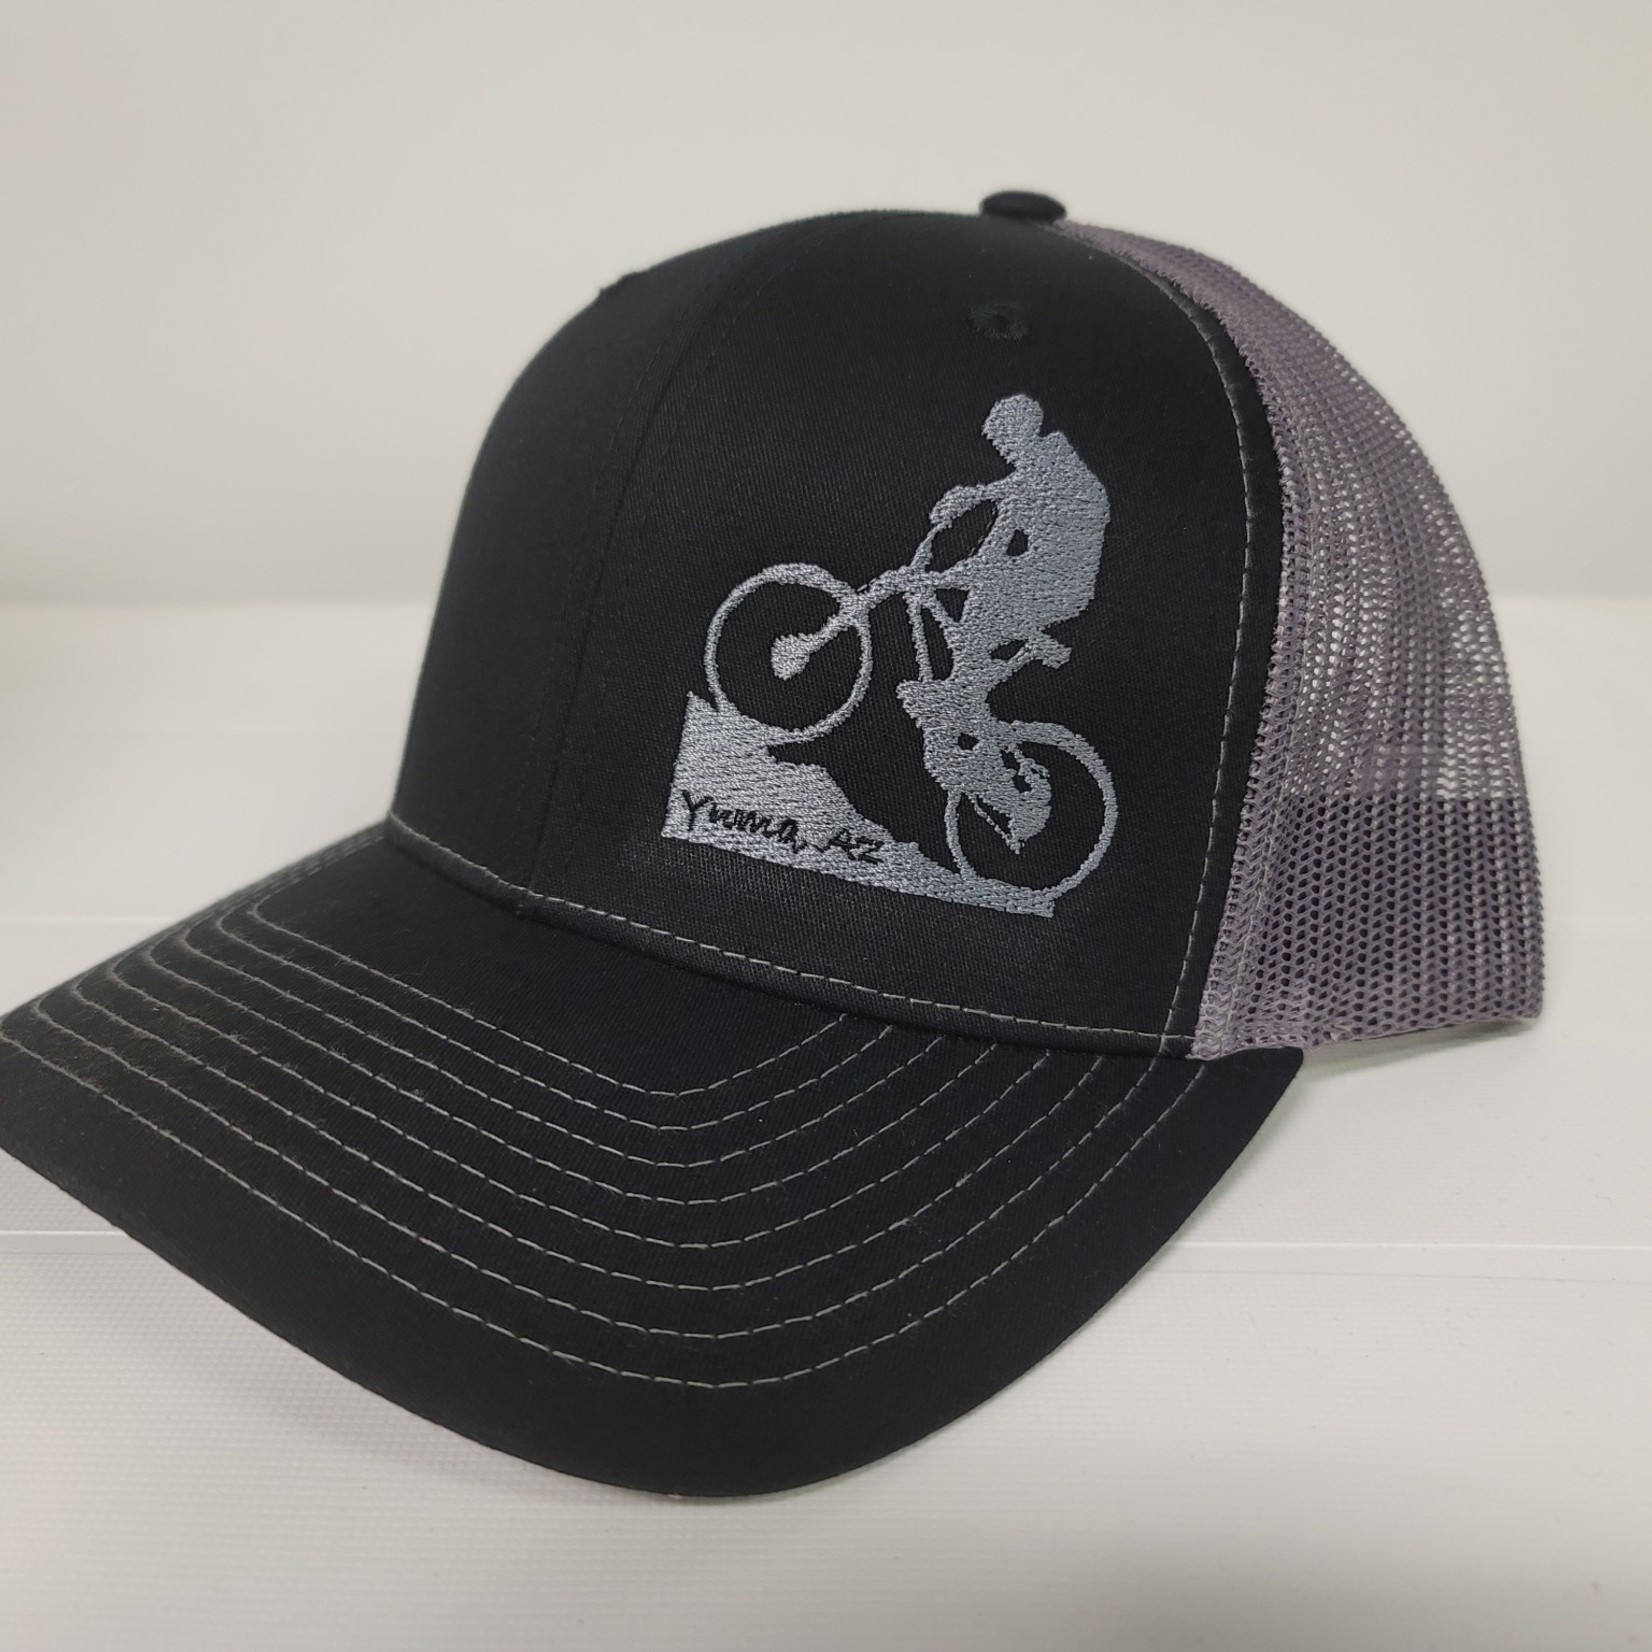 Richardson Hat - MTB - Blk/Grey - Snapback